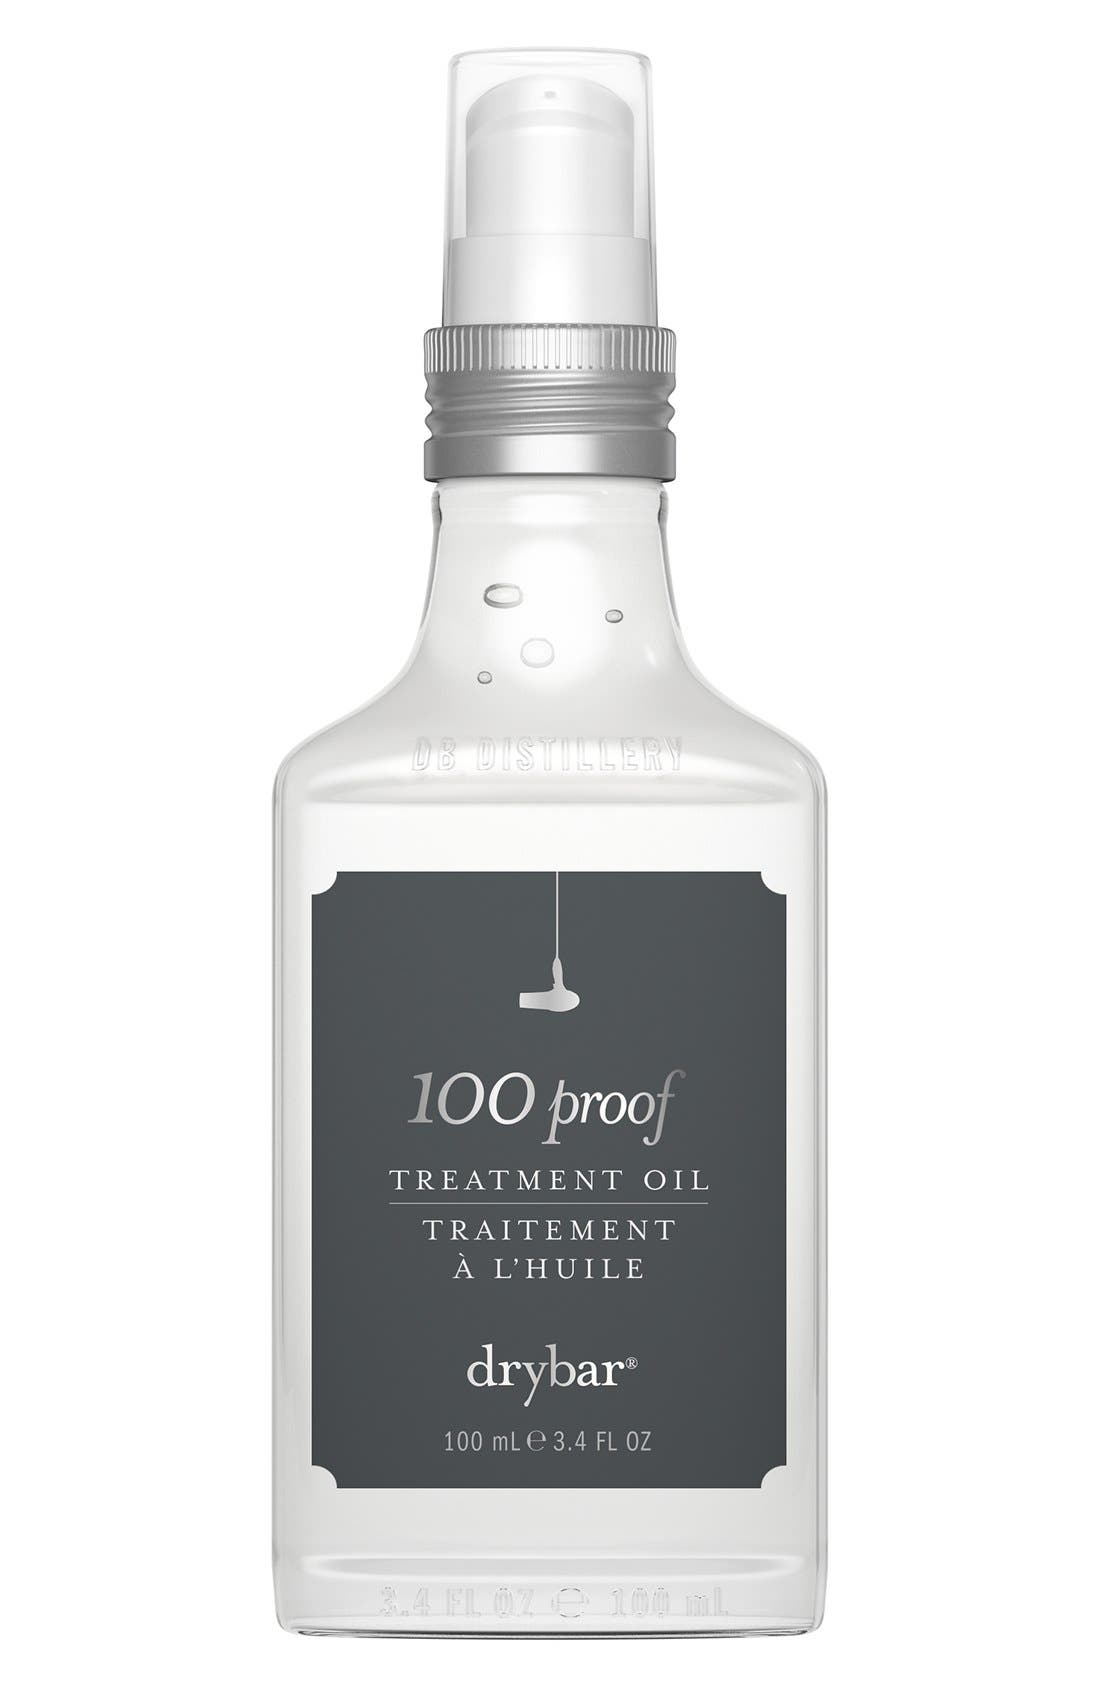 Drybar 100 Proof Treatment Oil